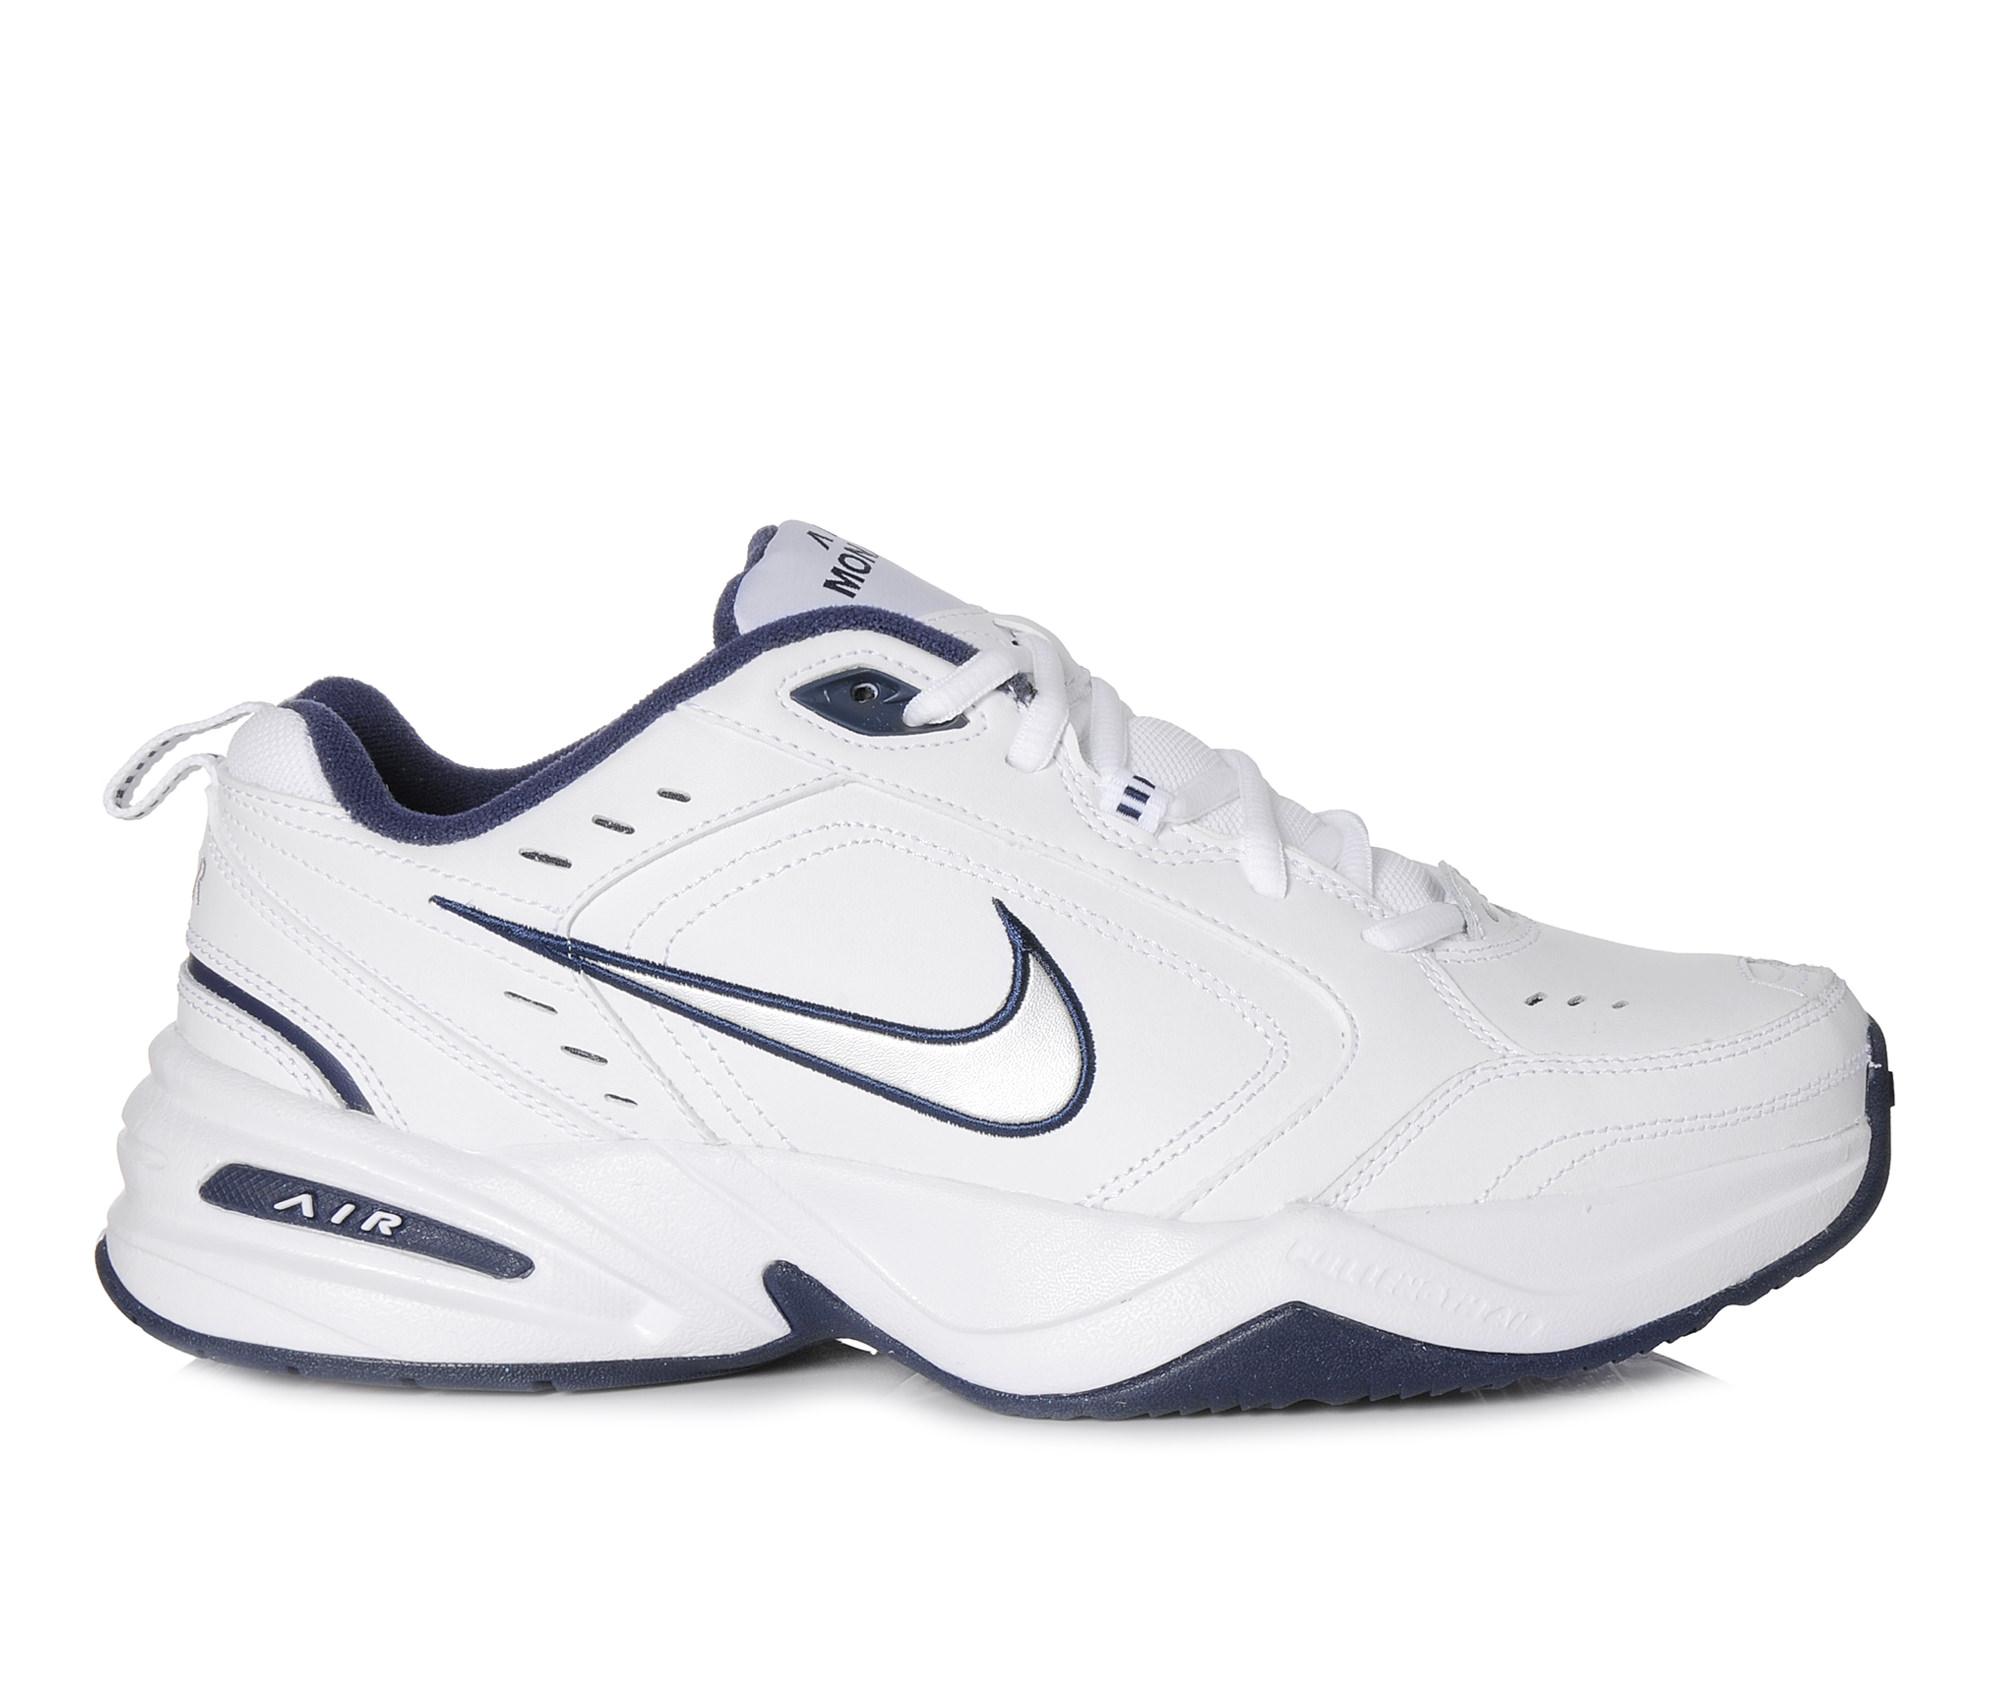 Men's Nike Air Monarch IV Training Shoe (White - Size 10) 1143326